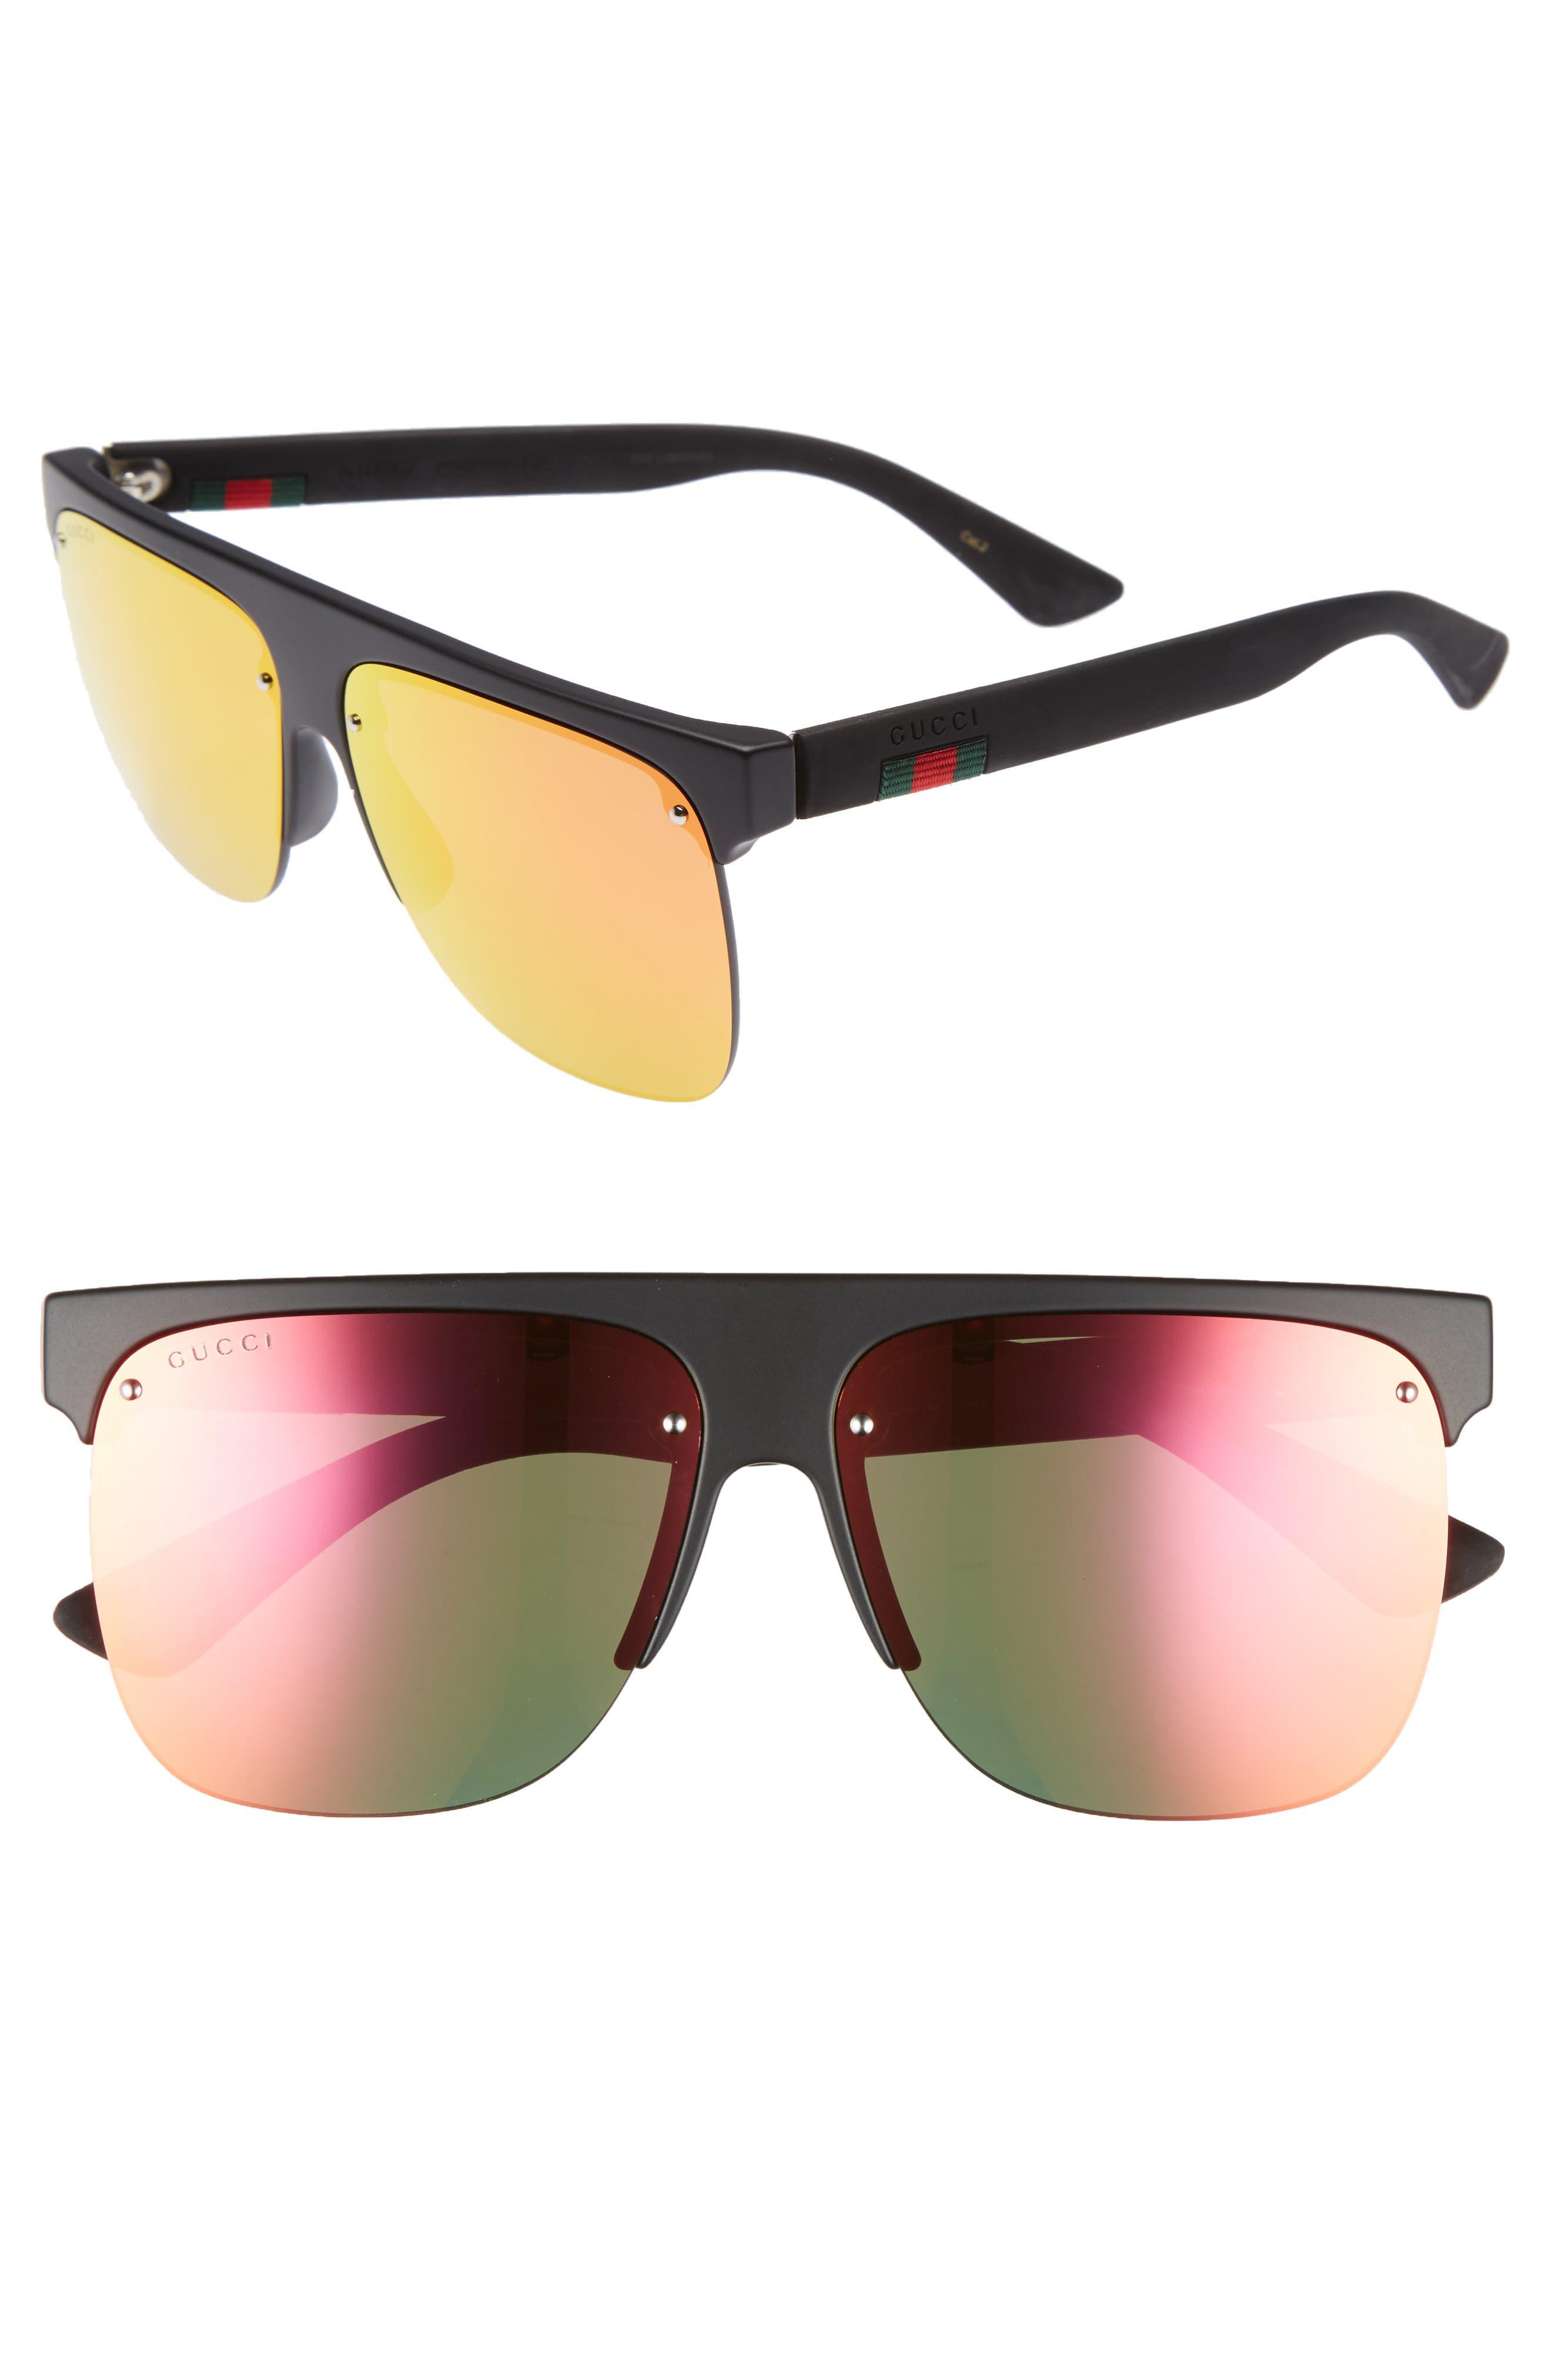 60mm Semi Rimless Polarized Sunglasses,                         Main,                         color, 001